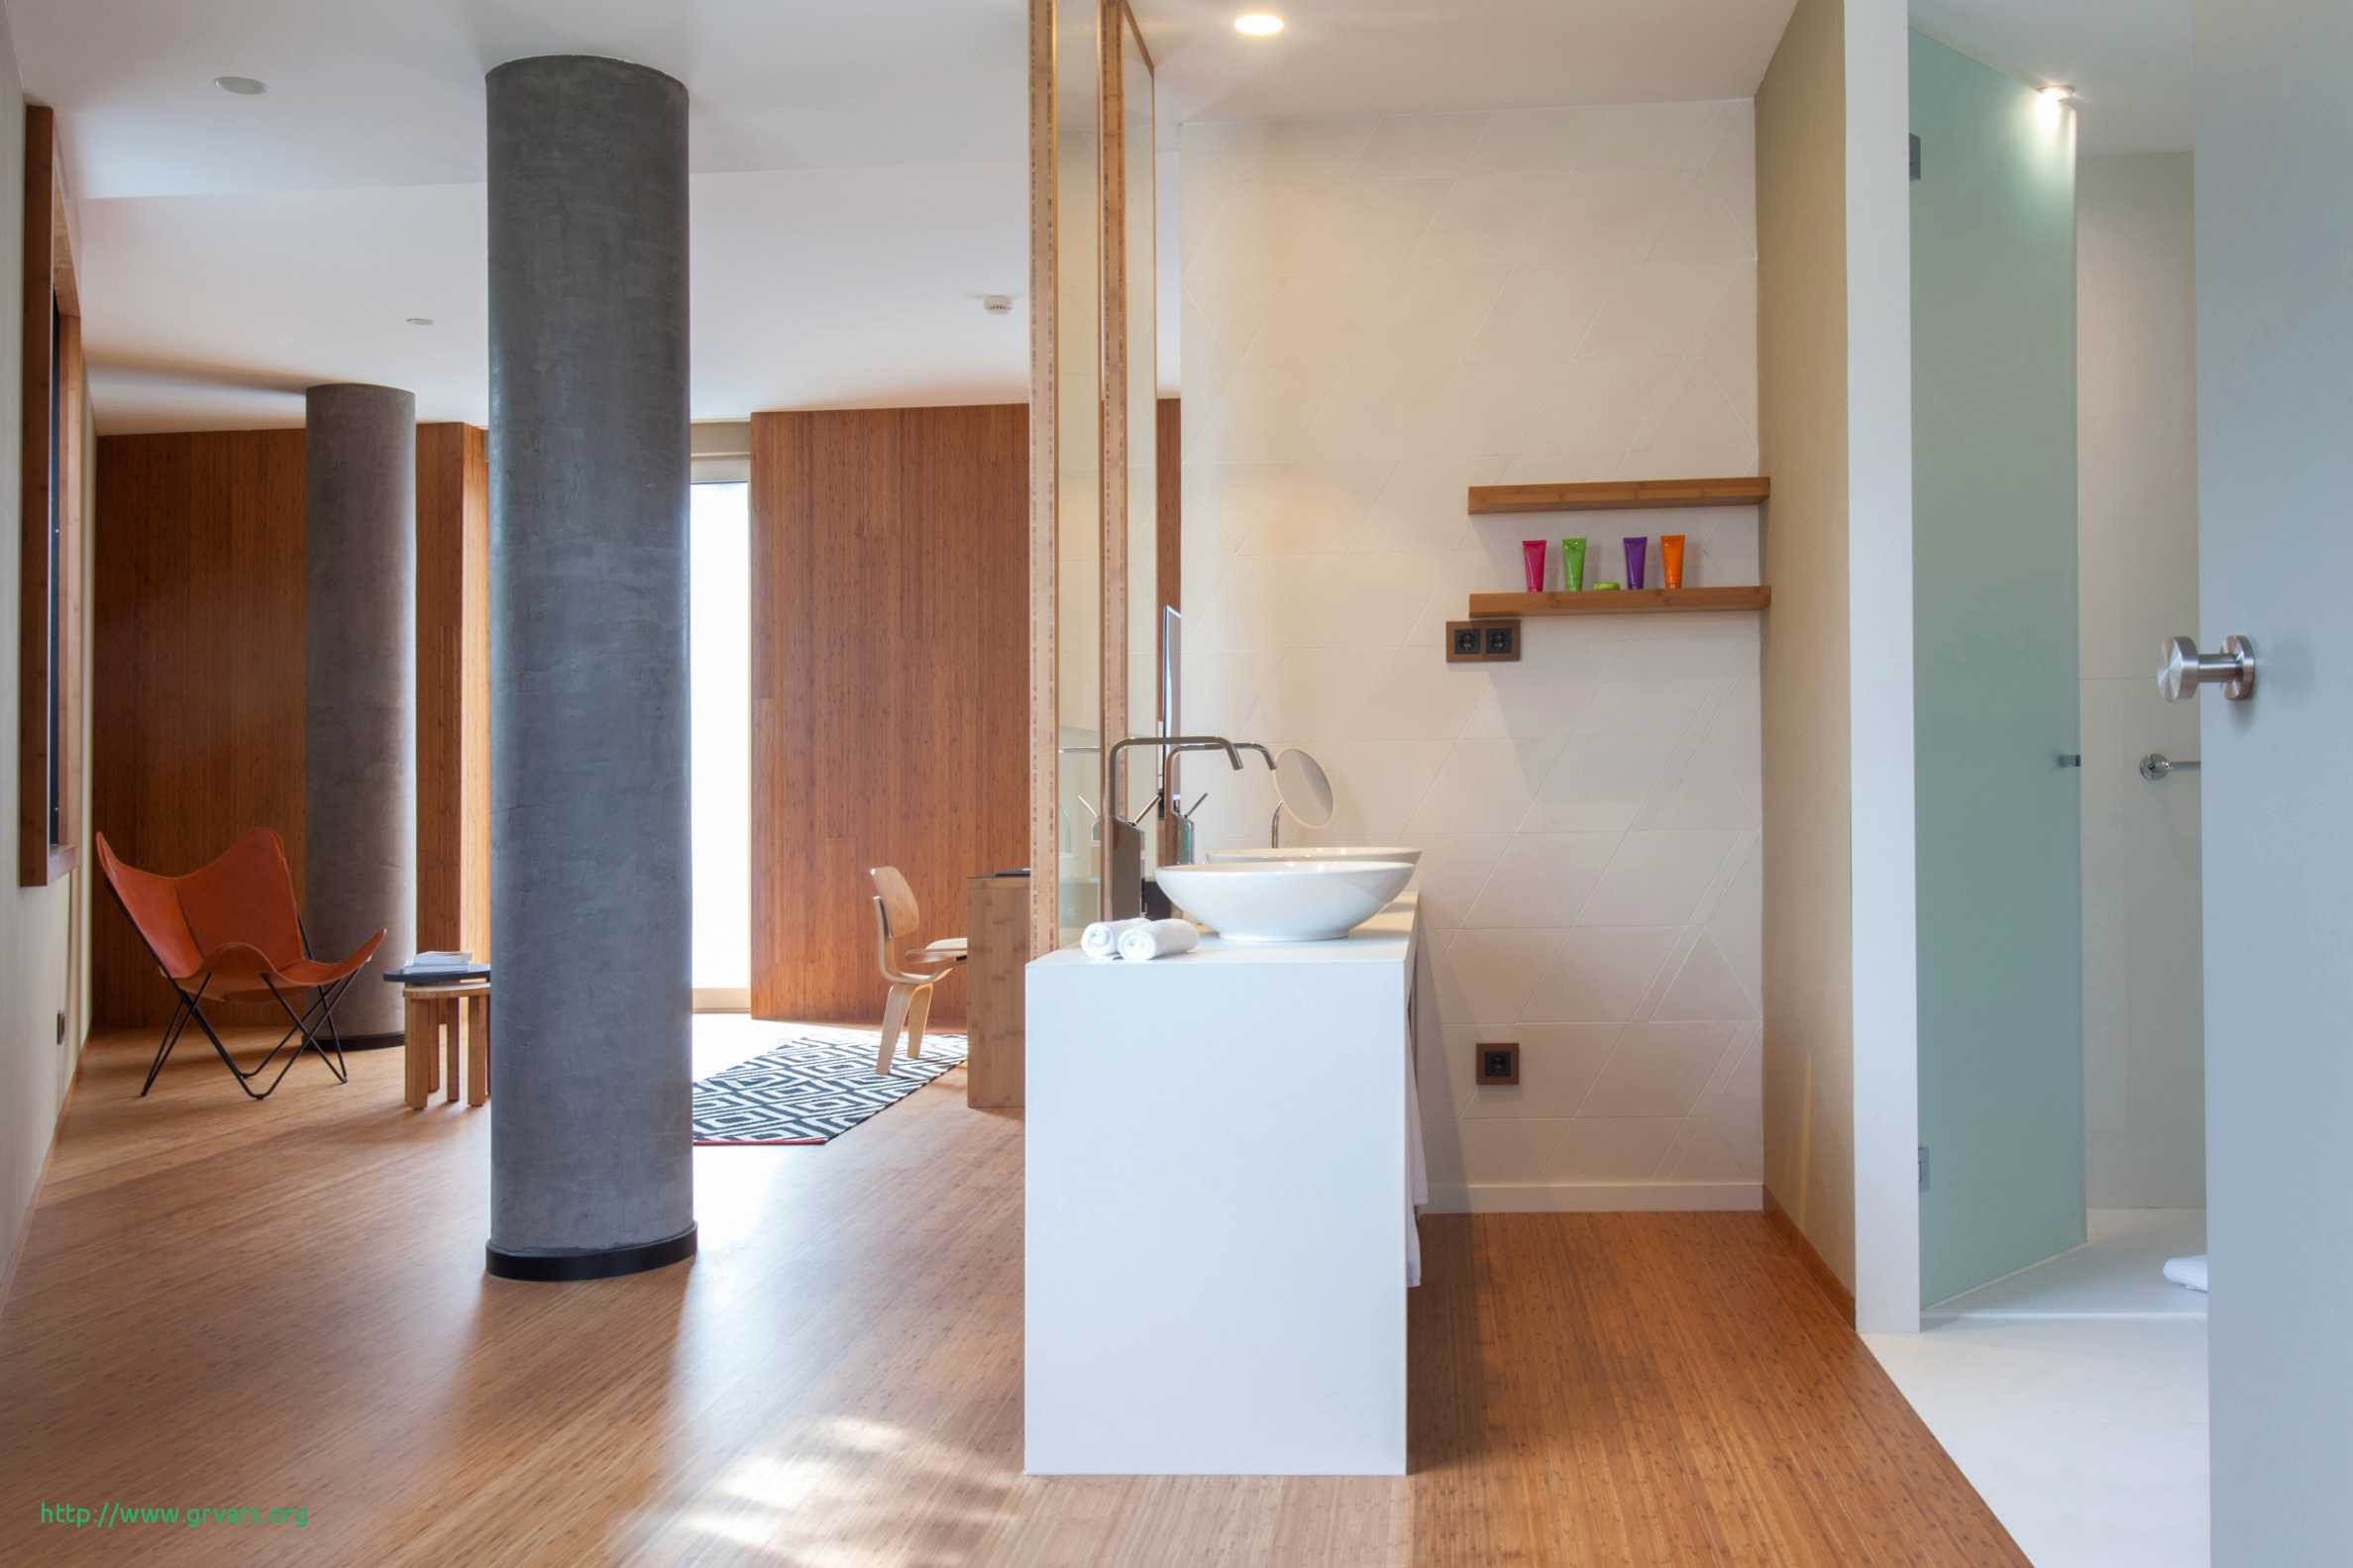 Bamboo Flooring or Engineered Hardwood Of 19 Beau Can Bamboo Flooring Be Used In A Bathroom Ideas Blog Intended for Can Bamboo Flooring Be Used In A Bathroom Unique 50 New Floor and Decor Wood Look